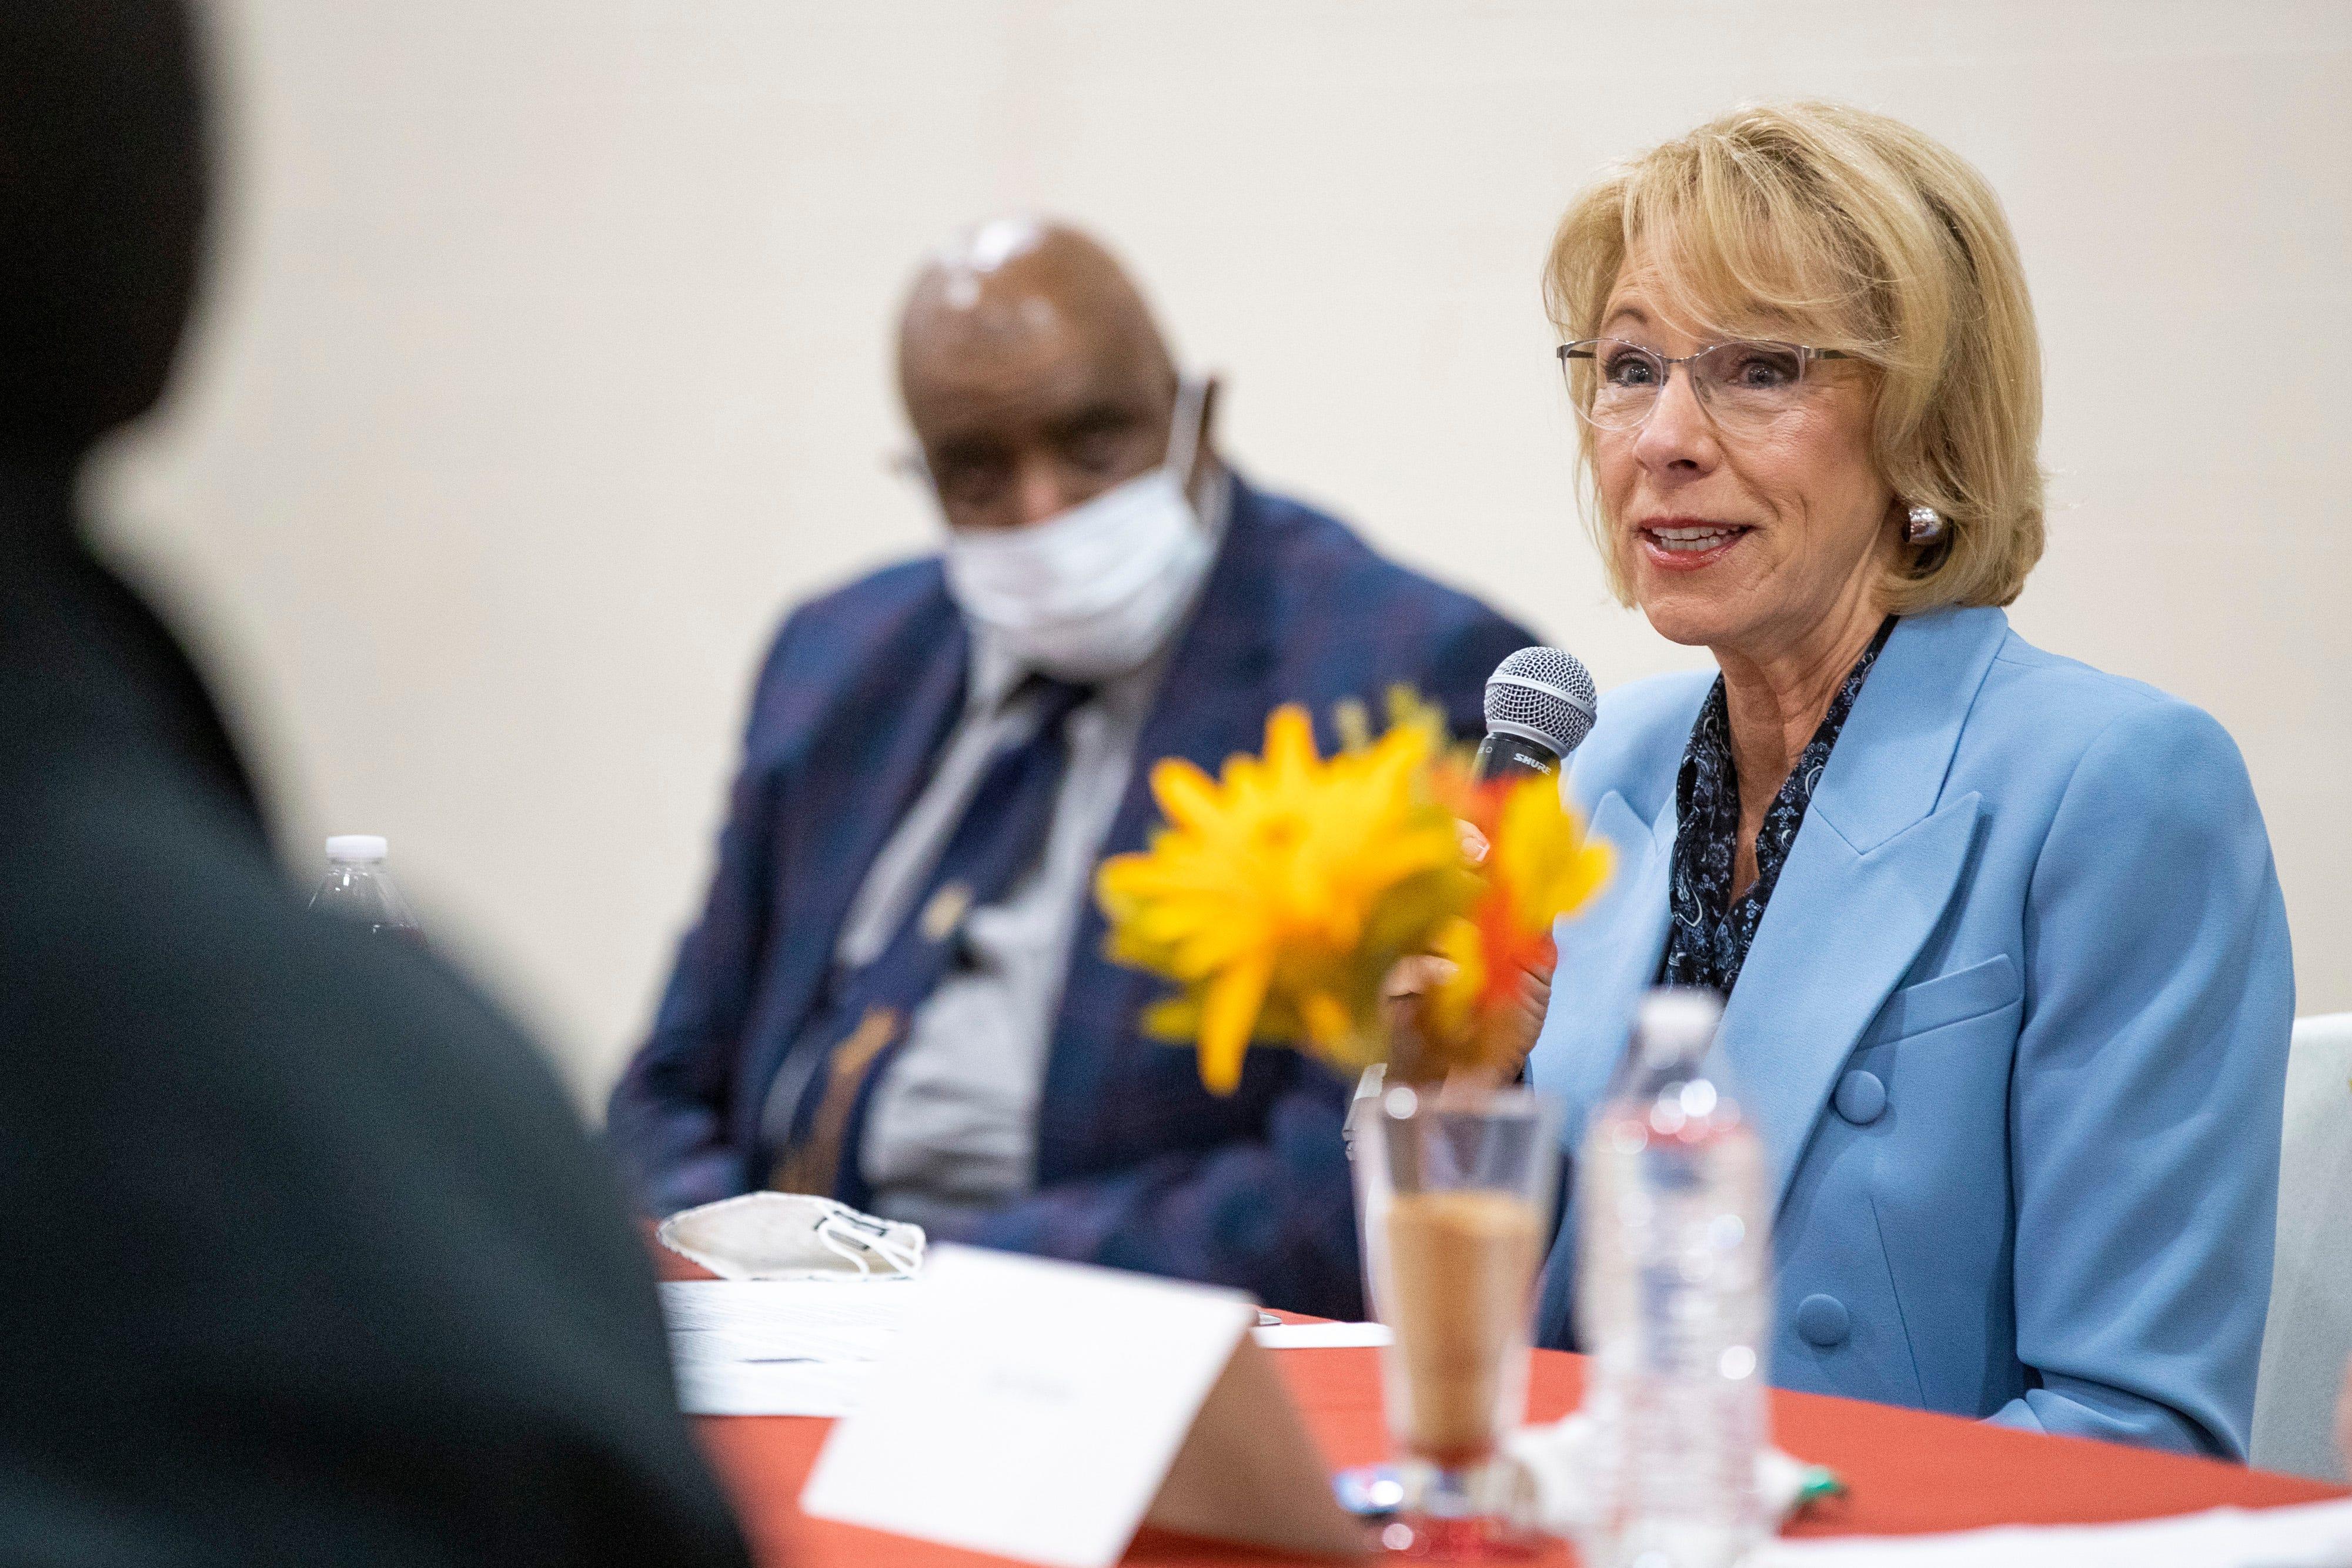 Education Secretary Betsy DeVos discusses school choice, COVID-19 during Louisville visit